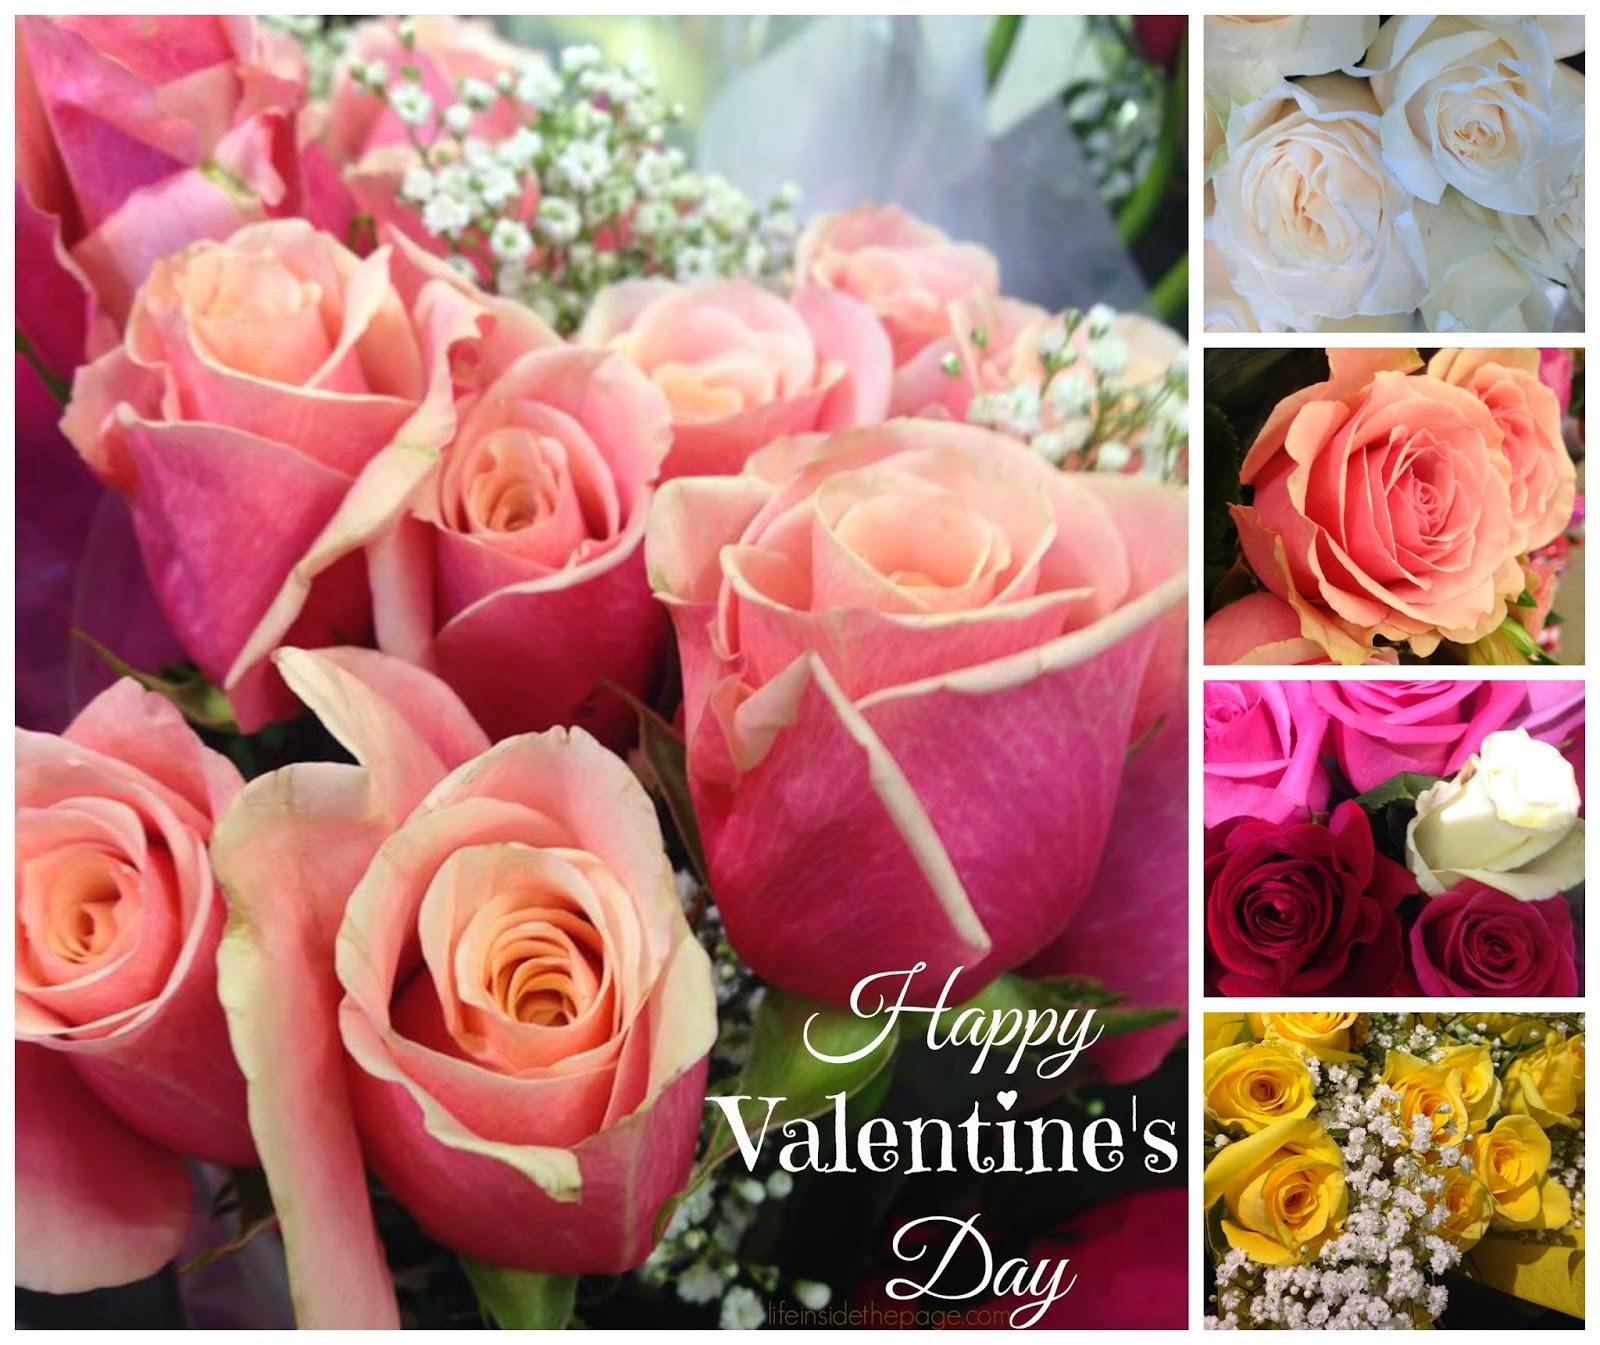 Happy Valentine's Day | February 14, 2015